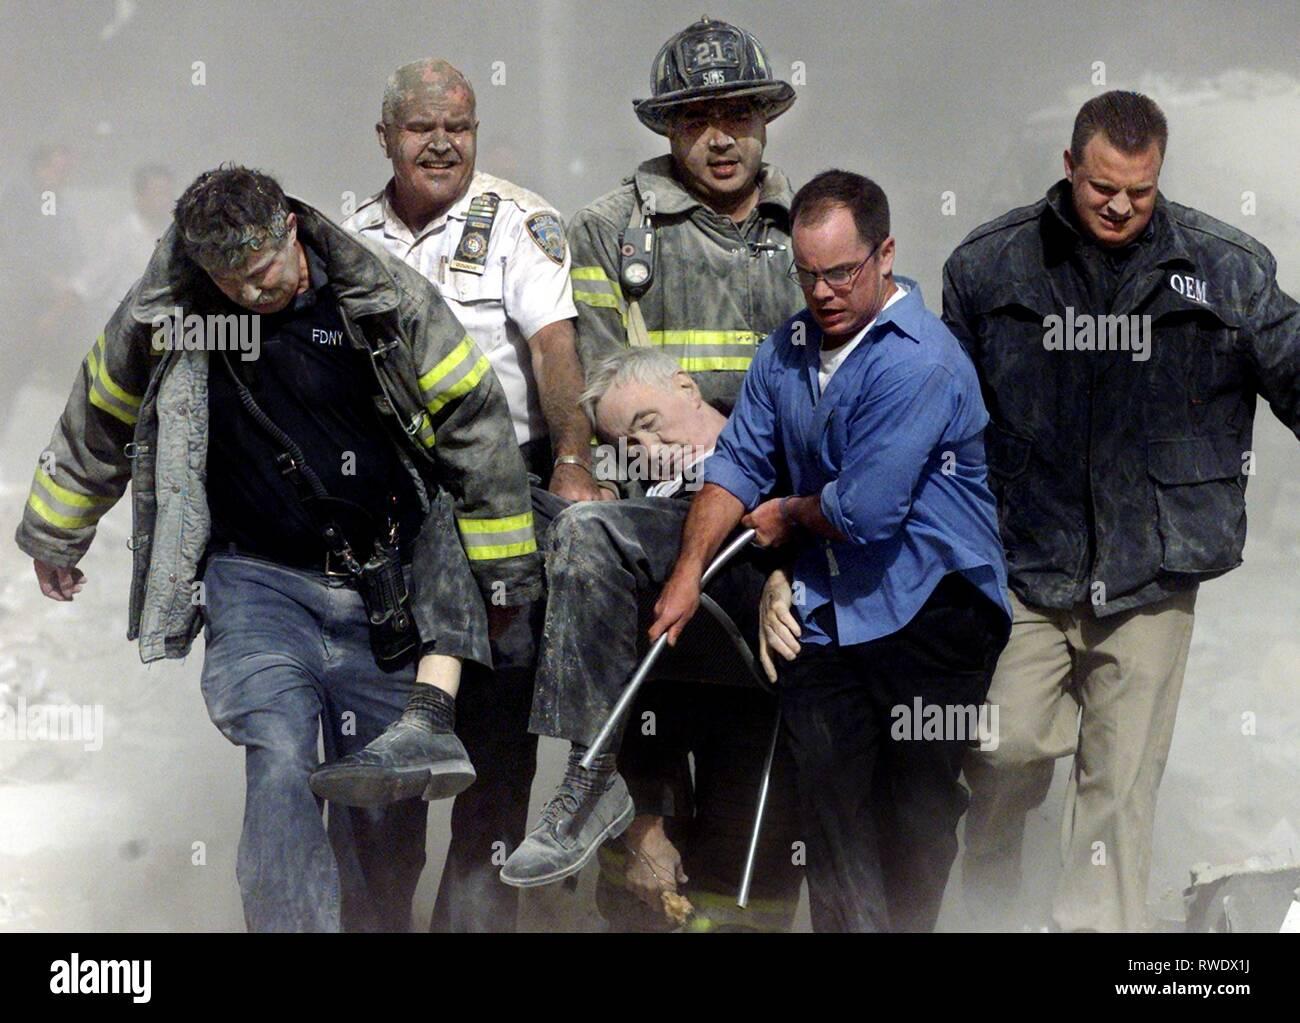 JUDGE,RESCUERS, SAINT OF 9/11, 2006 - Stock Image